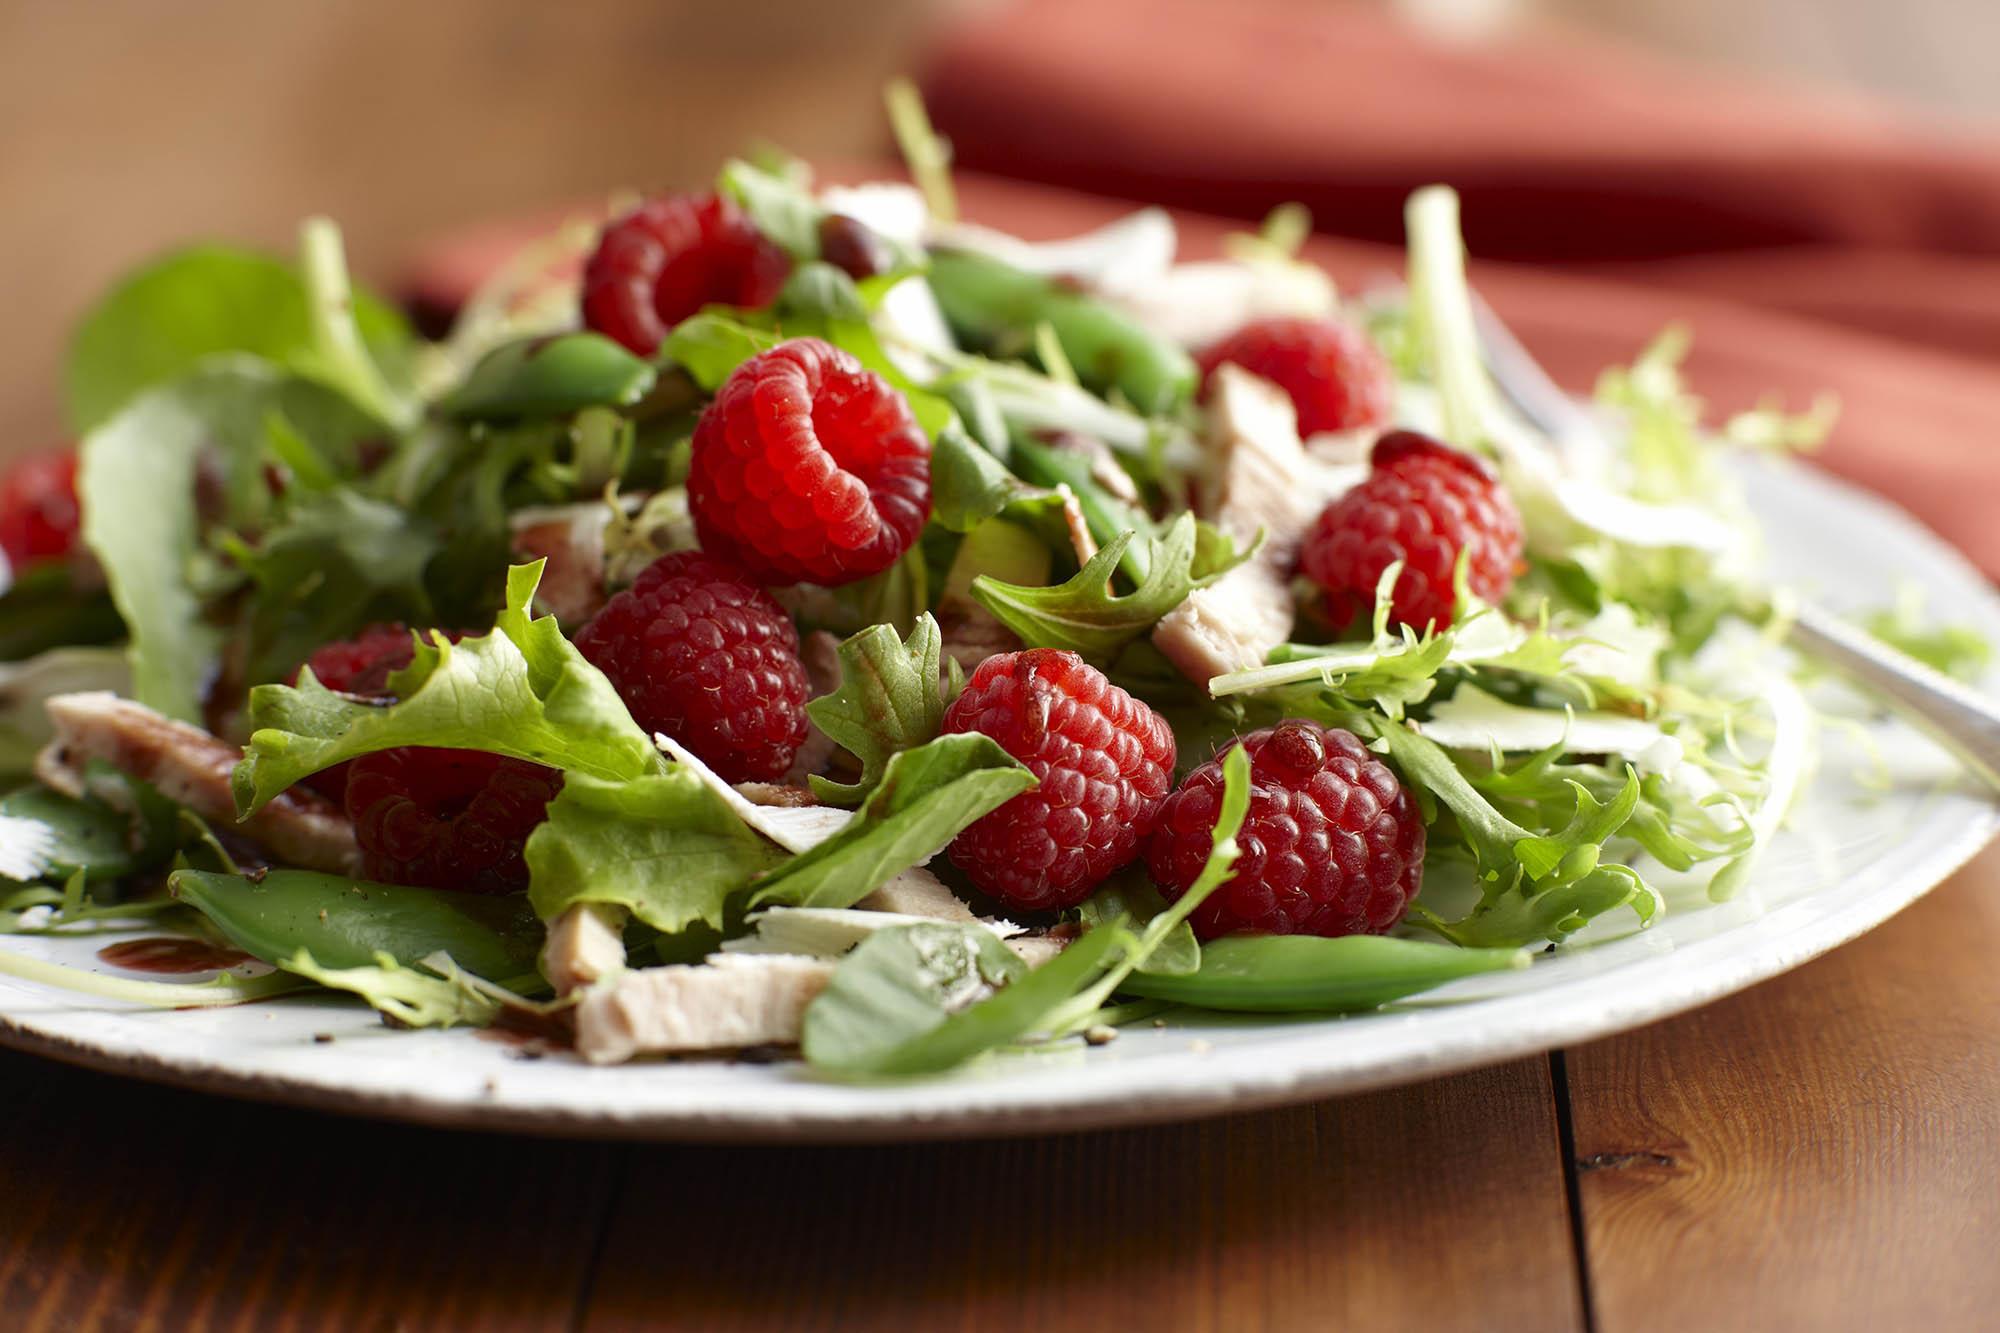 Menu For Olive Garden: Raspberry Turkey Salad With Raspberry Vinaigrette